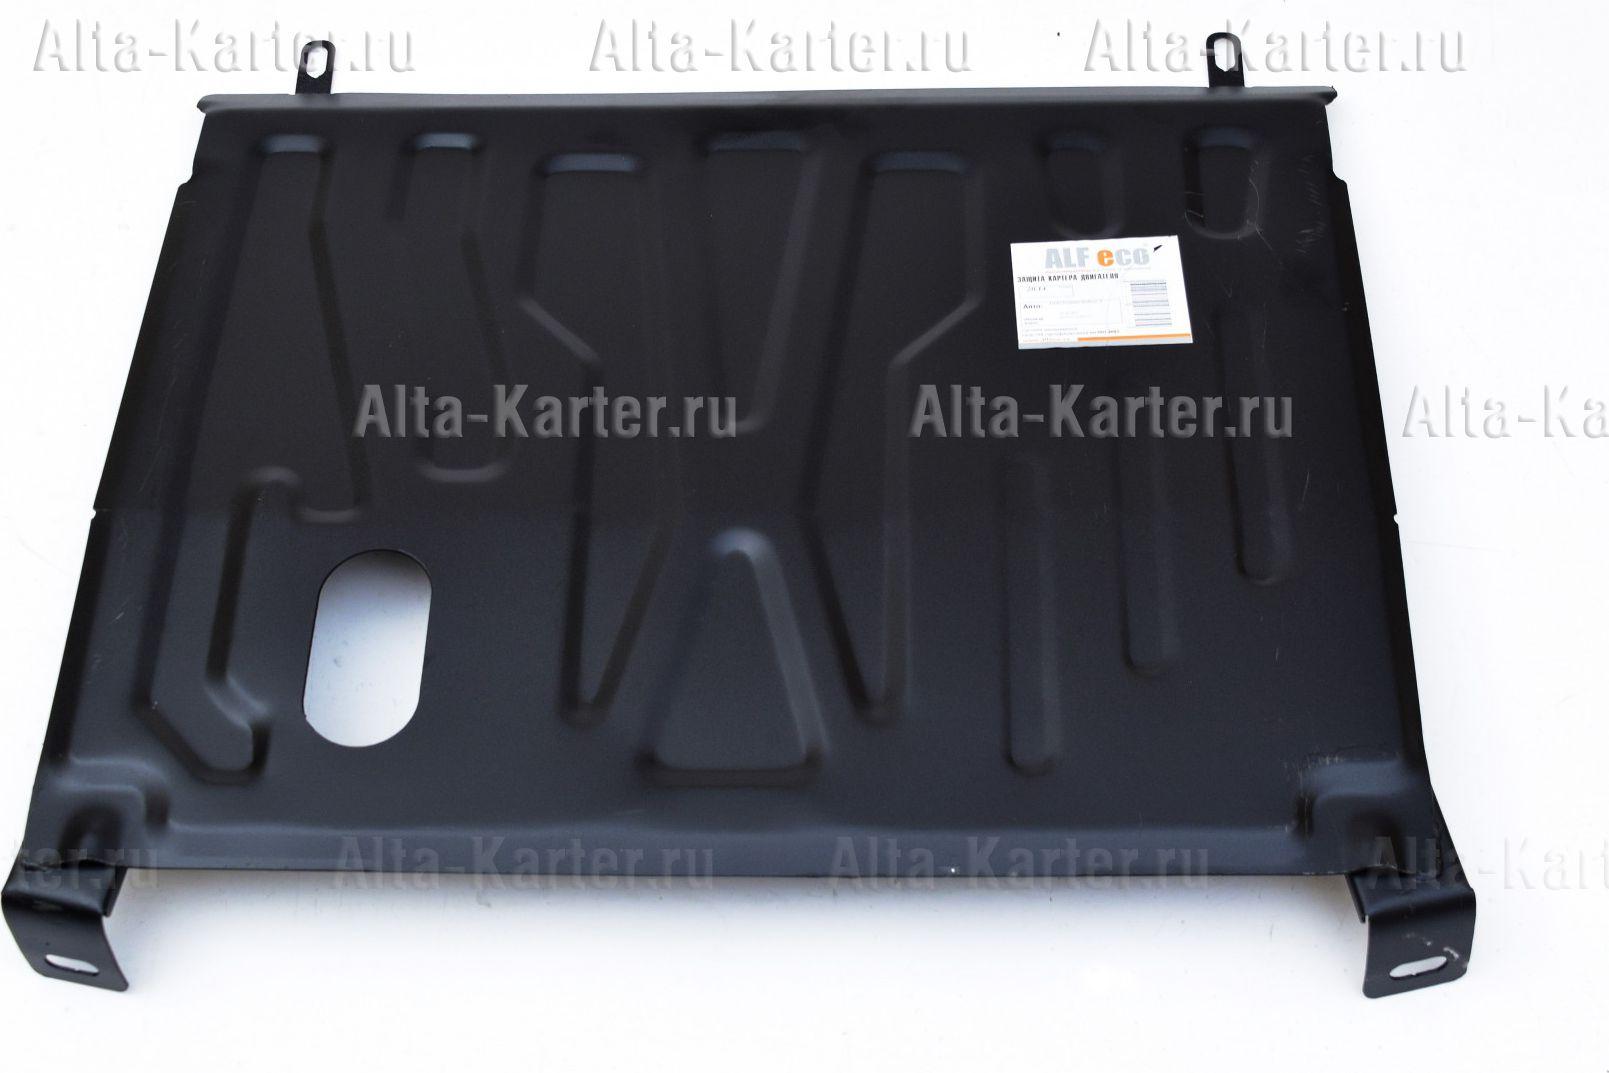 Защита Alfeco для картера и МКПП Datsun on-DO 2014-2021. Артикул ALF.28.080st